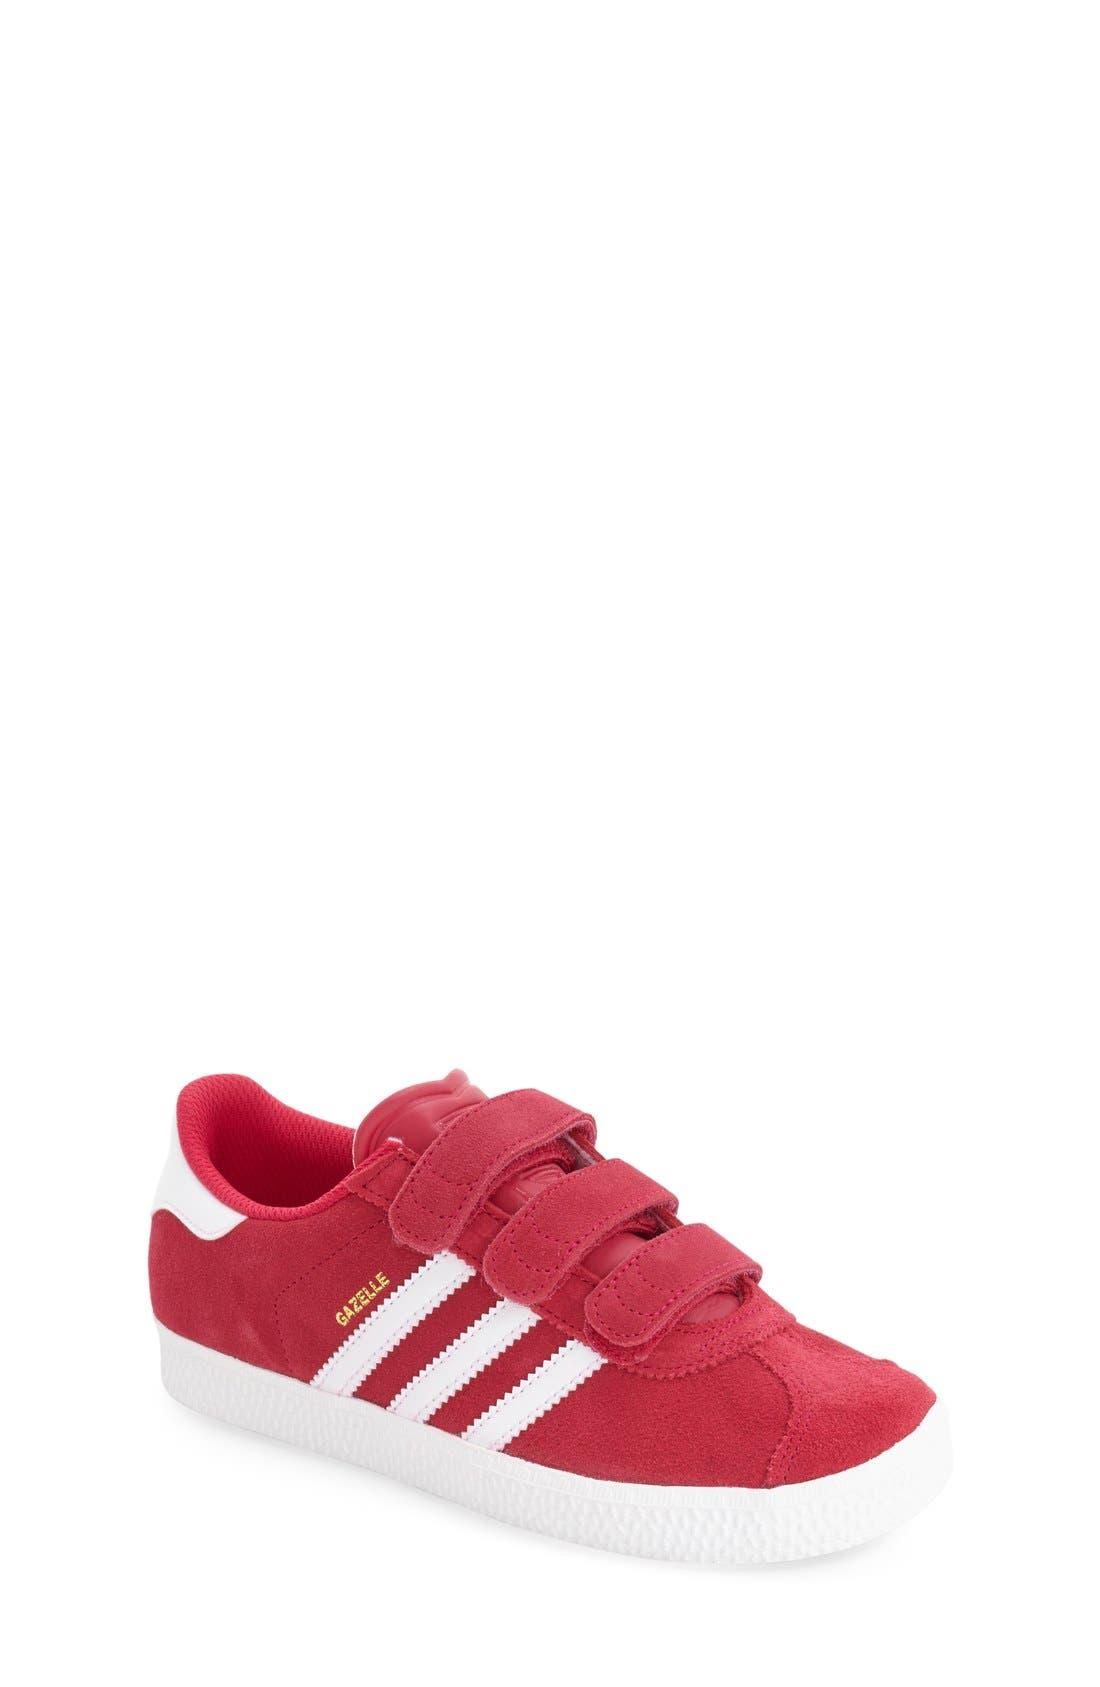 Gazelle Sneaker,                         Main,                         color, Pink